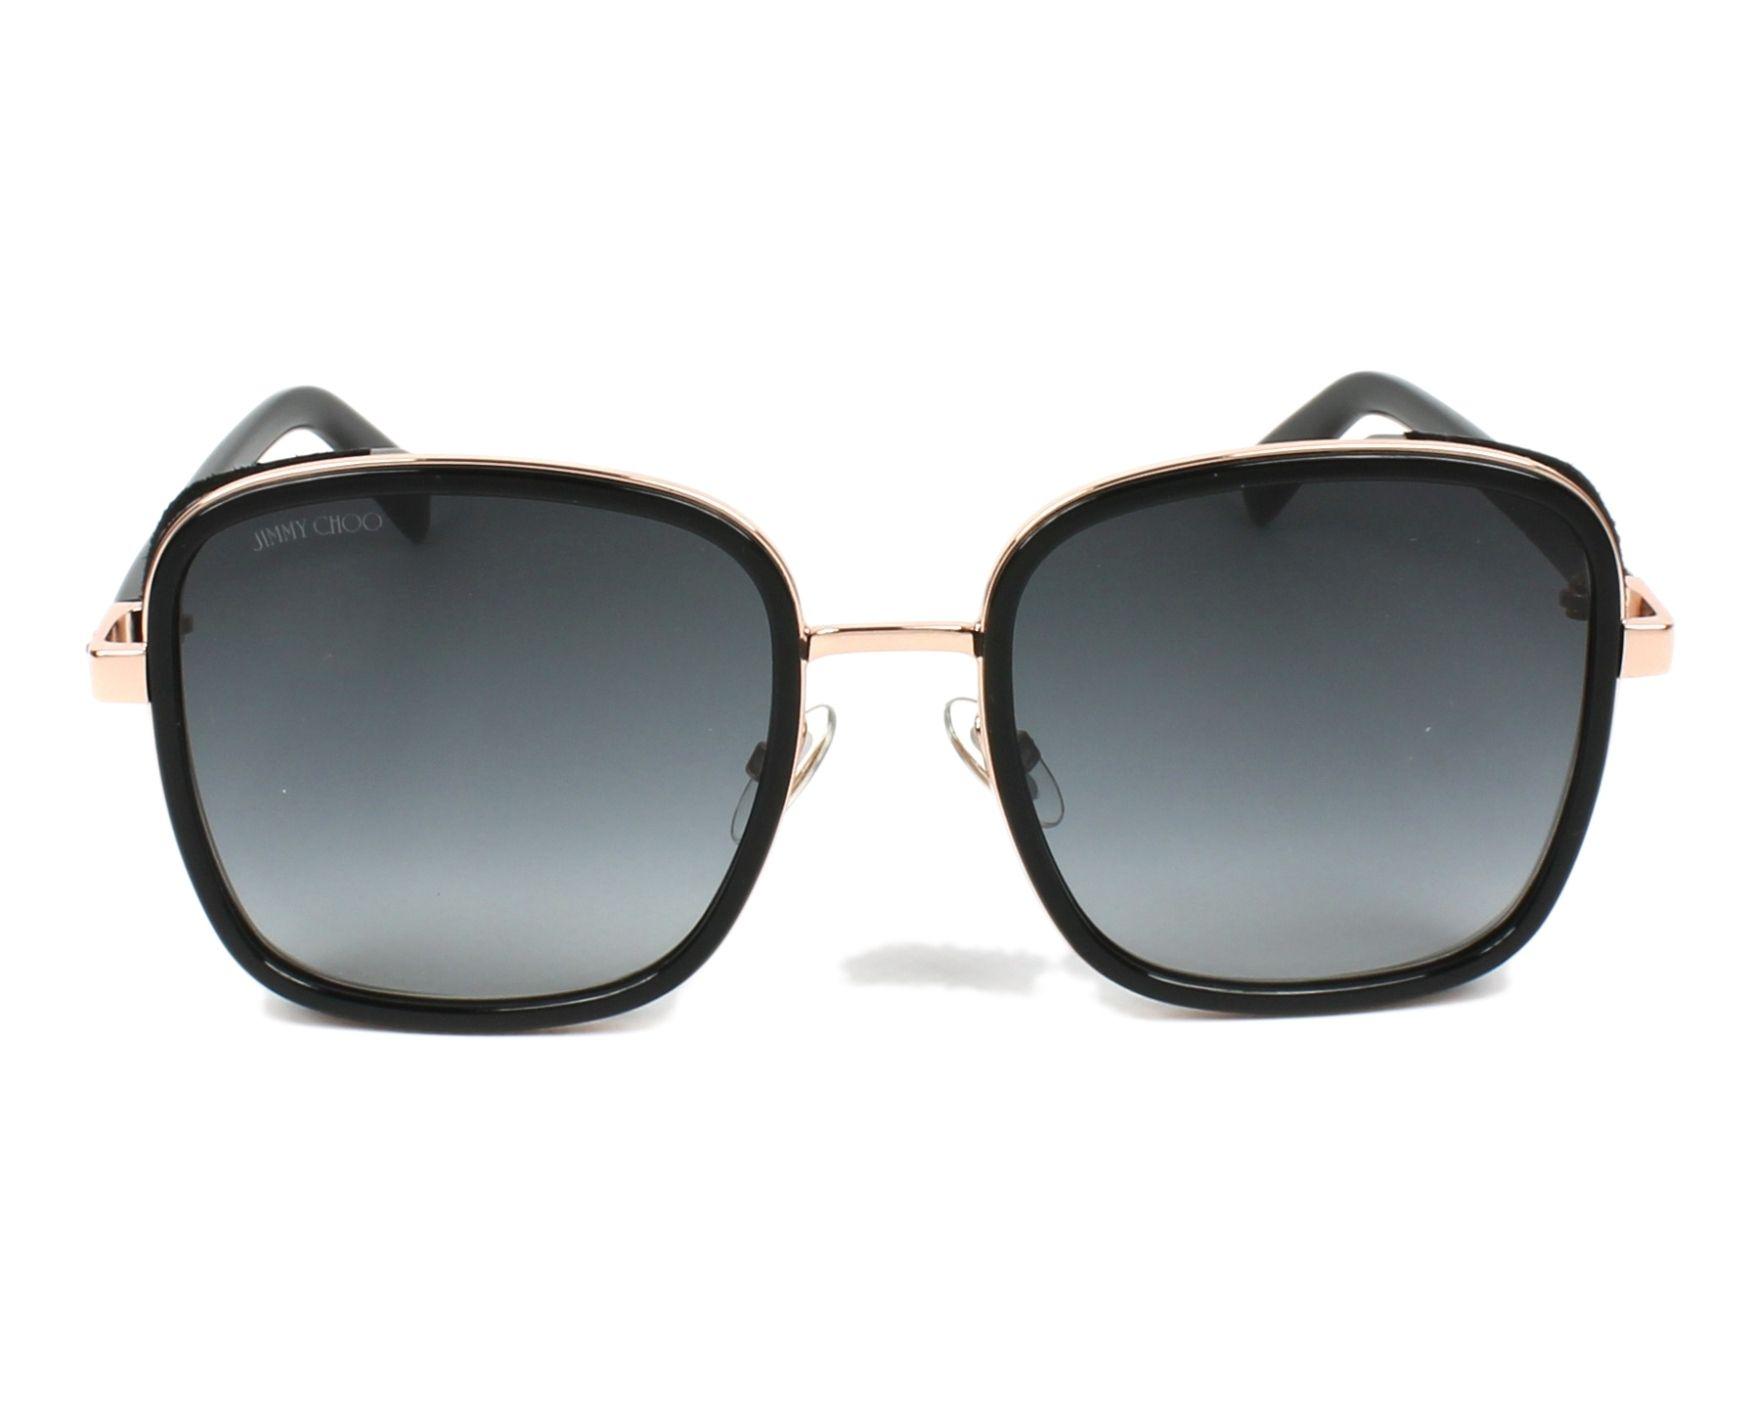 27d5df5b3655 Sunglasses Jimmy Choo ELVA-S 2M2 90 54-20 Black Gold Copper front